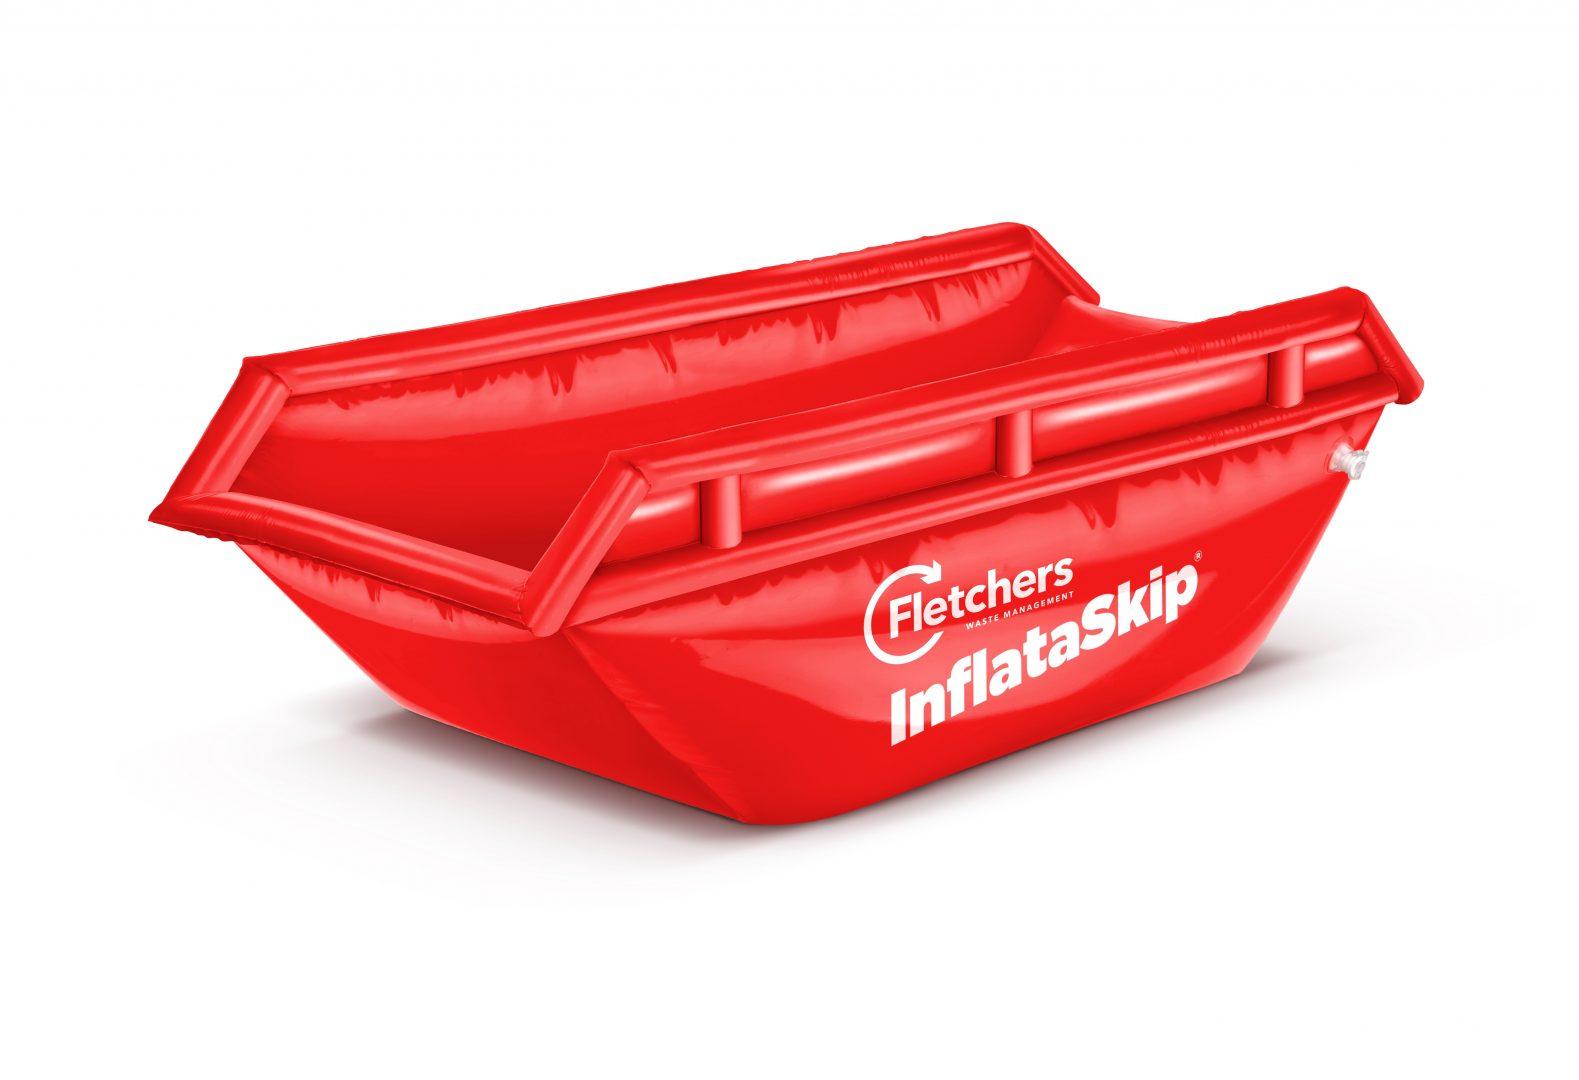 Fletchers Waste Inflataskip